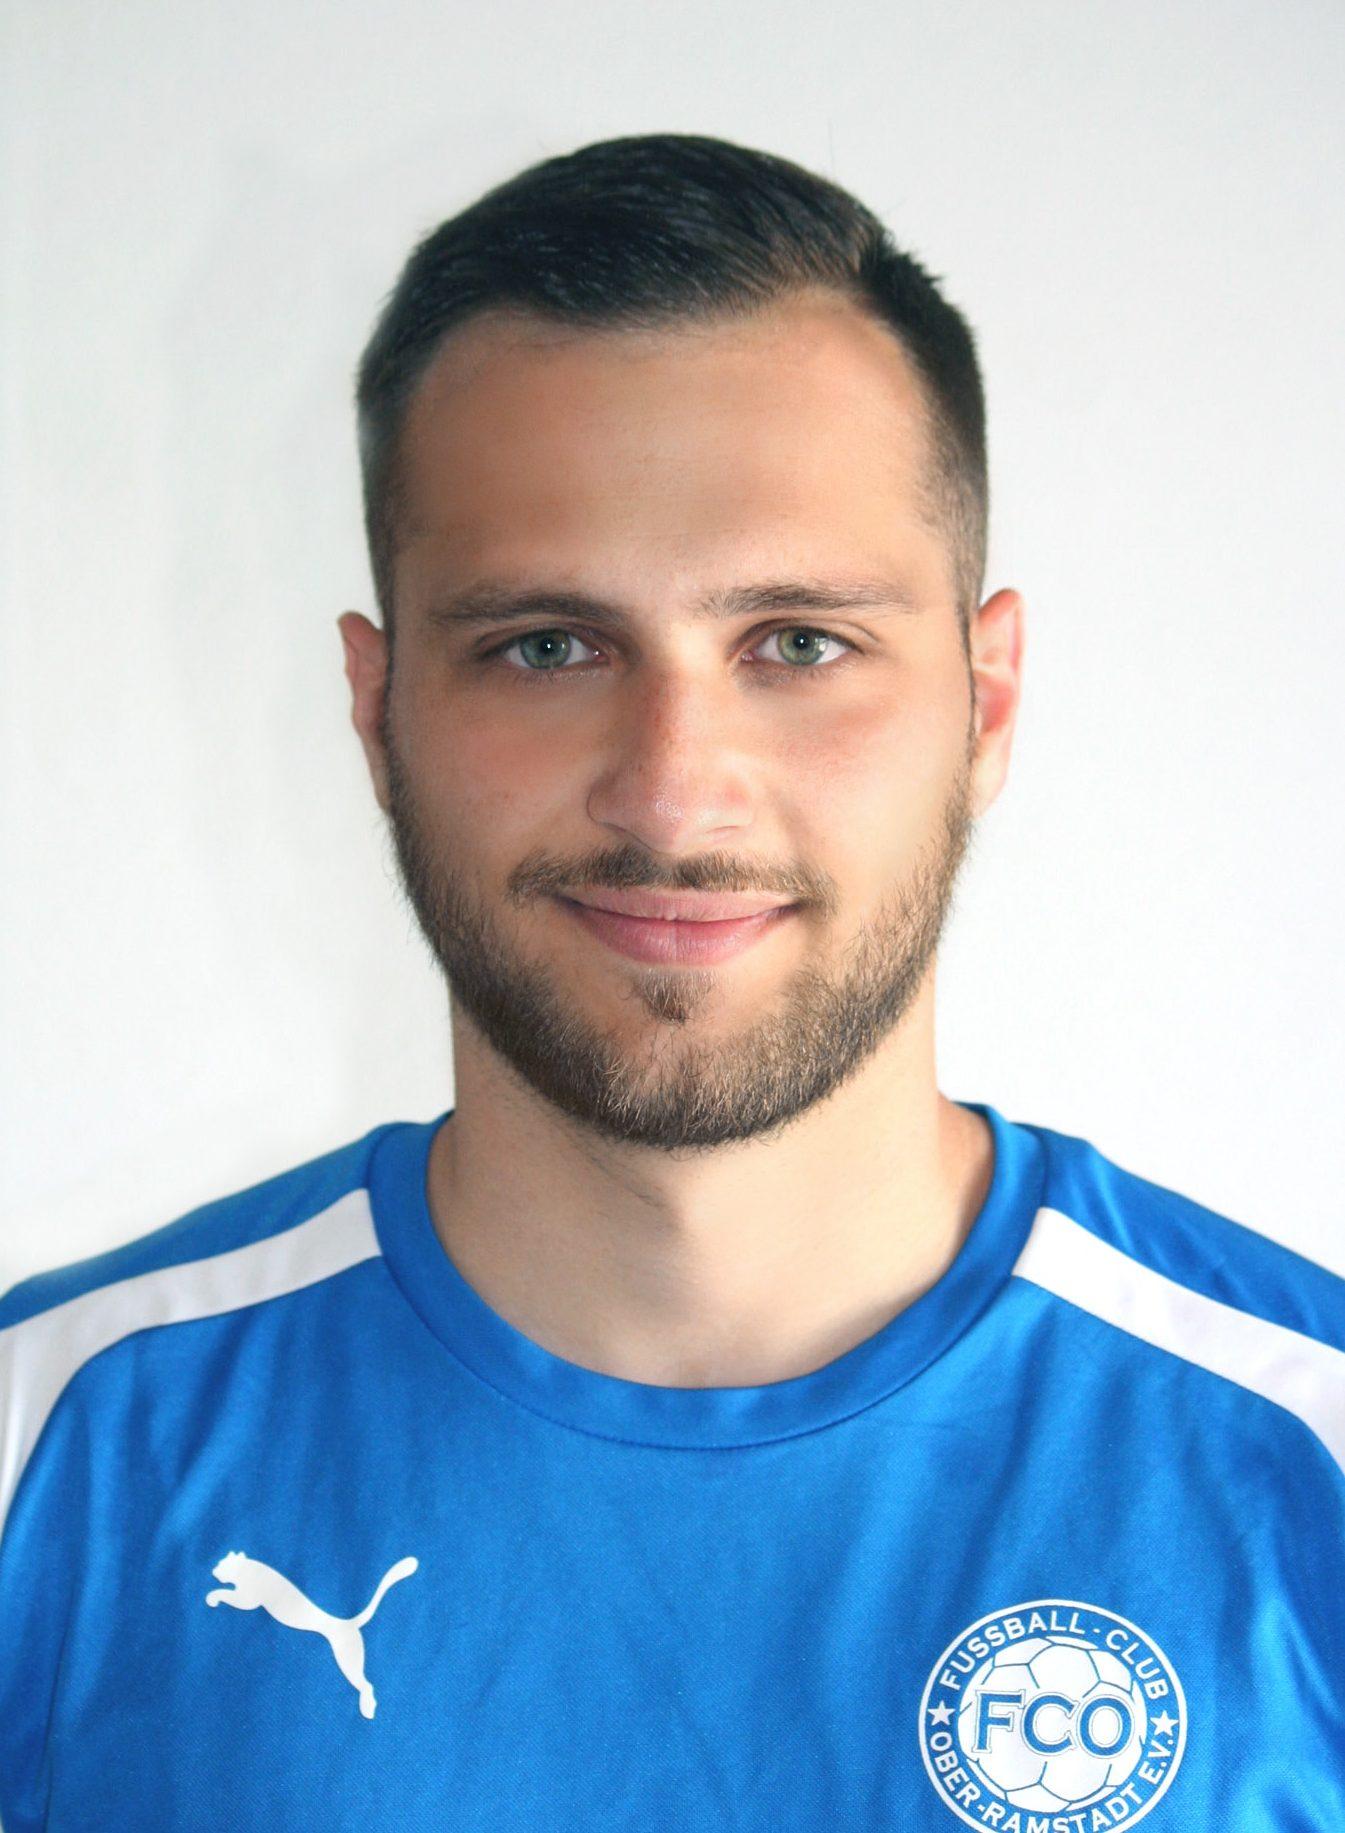 Nicola Castro